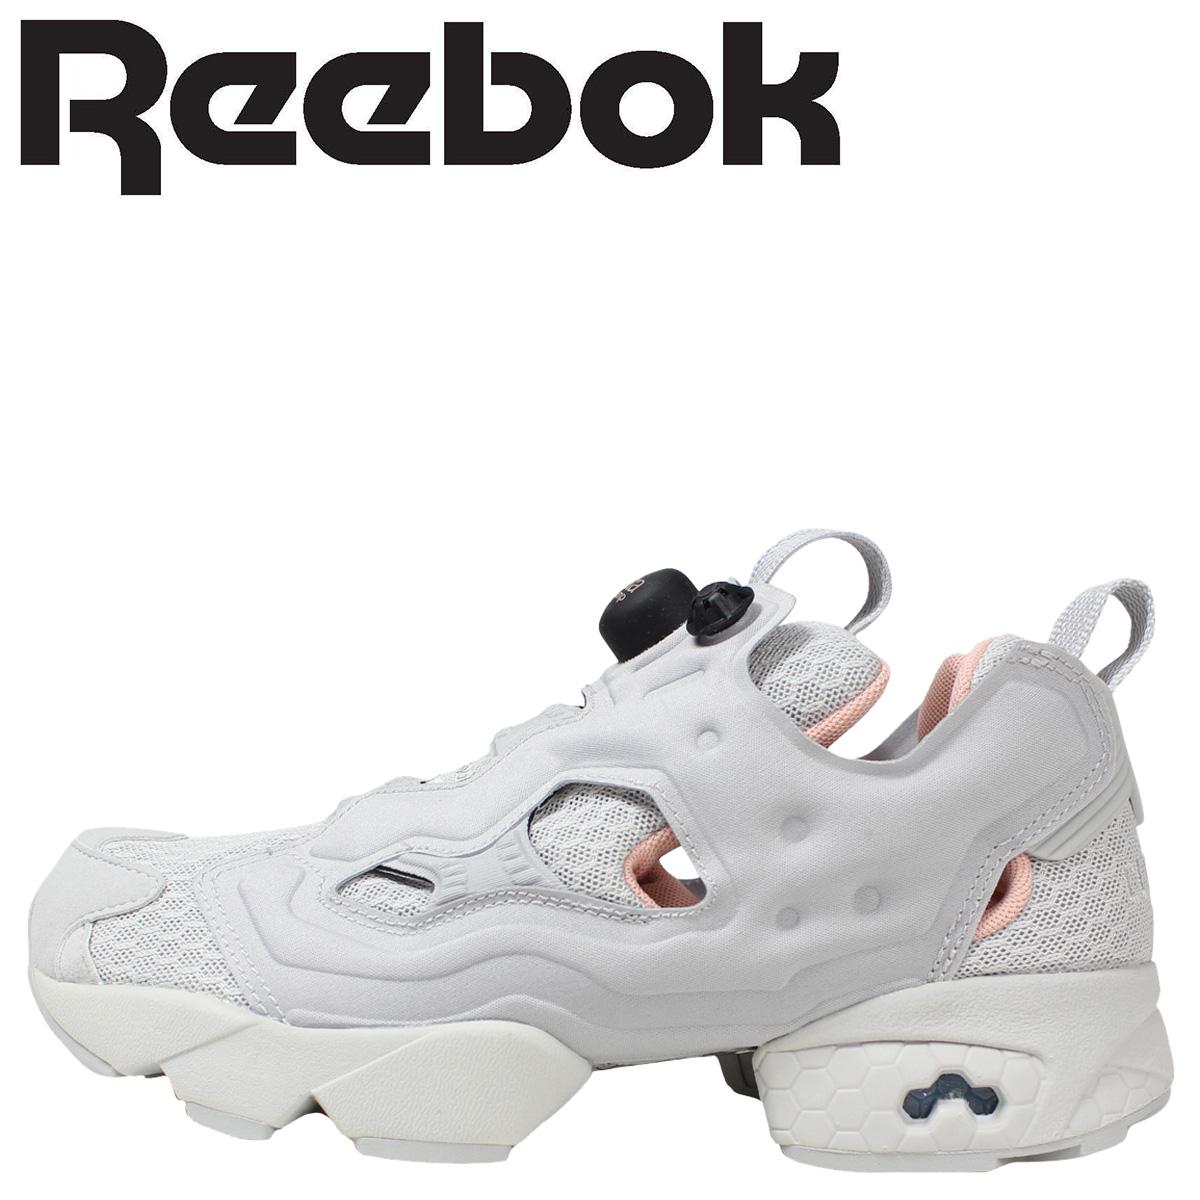 58930d0b7eb Reebok Reebok pump fury crashex sneakers INSTAPUMP FURY CLSHX V69687 men s  women s shoes white  ★ 10.